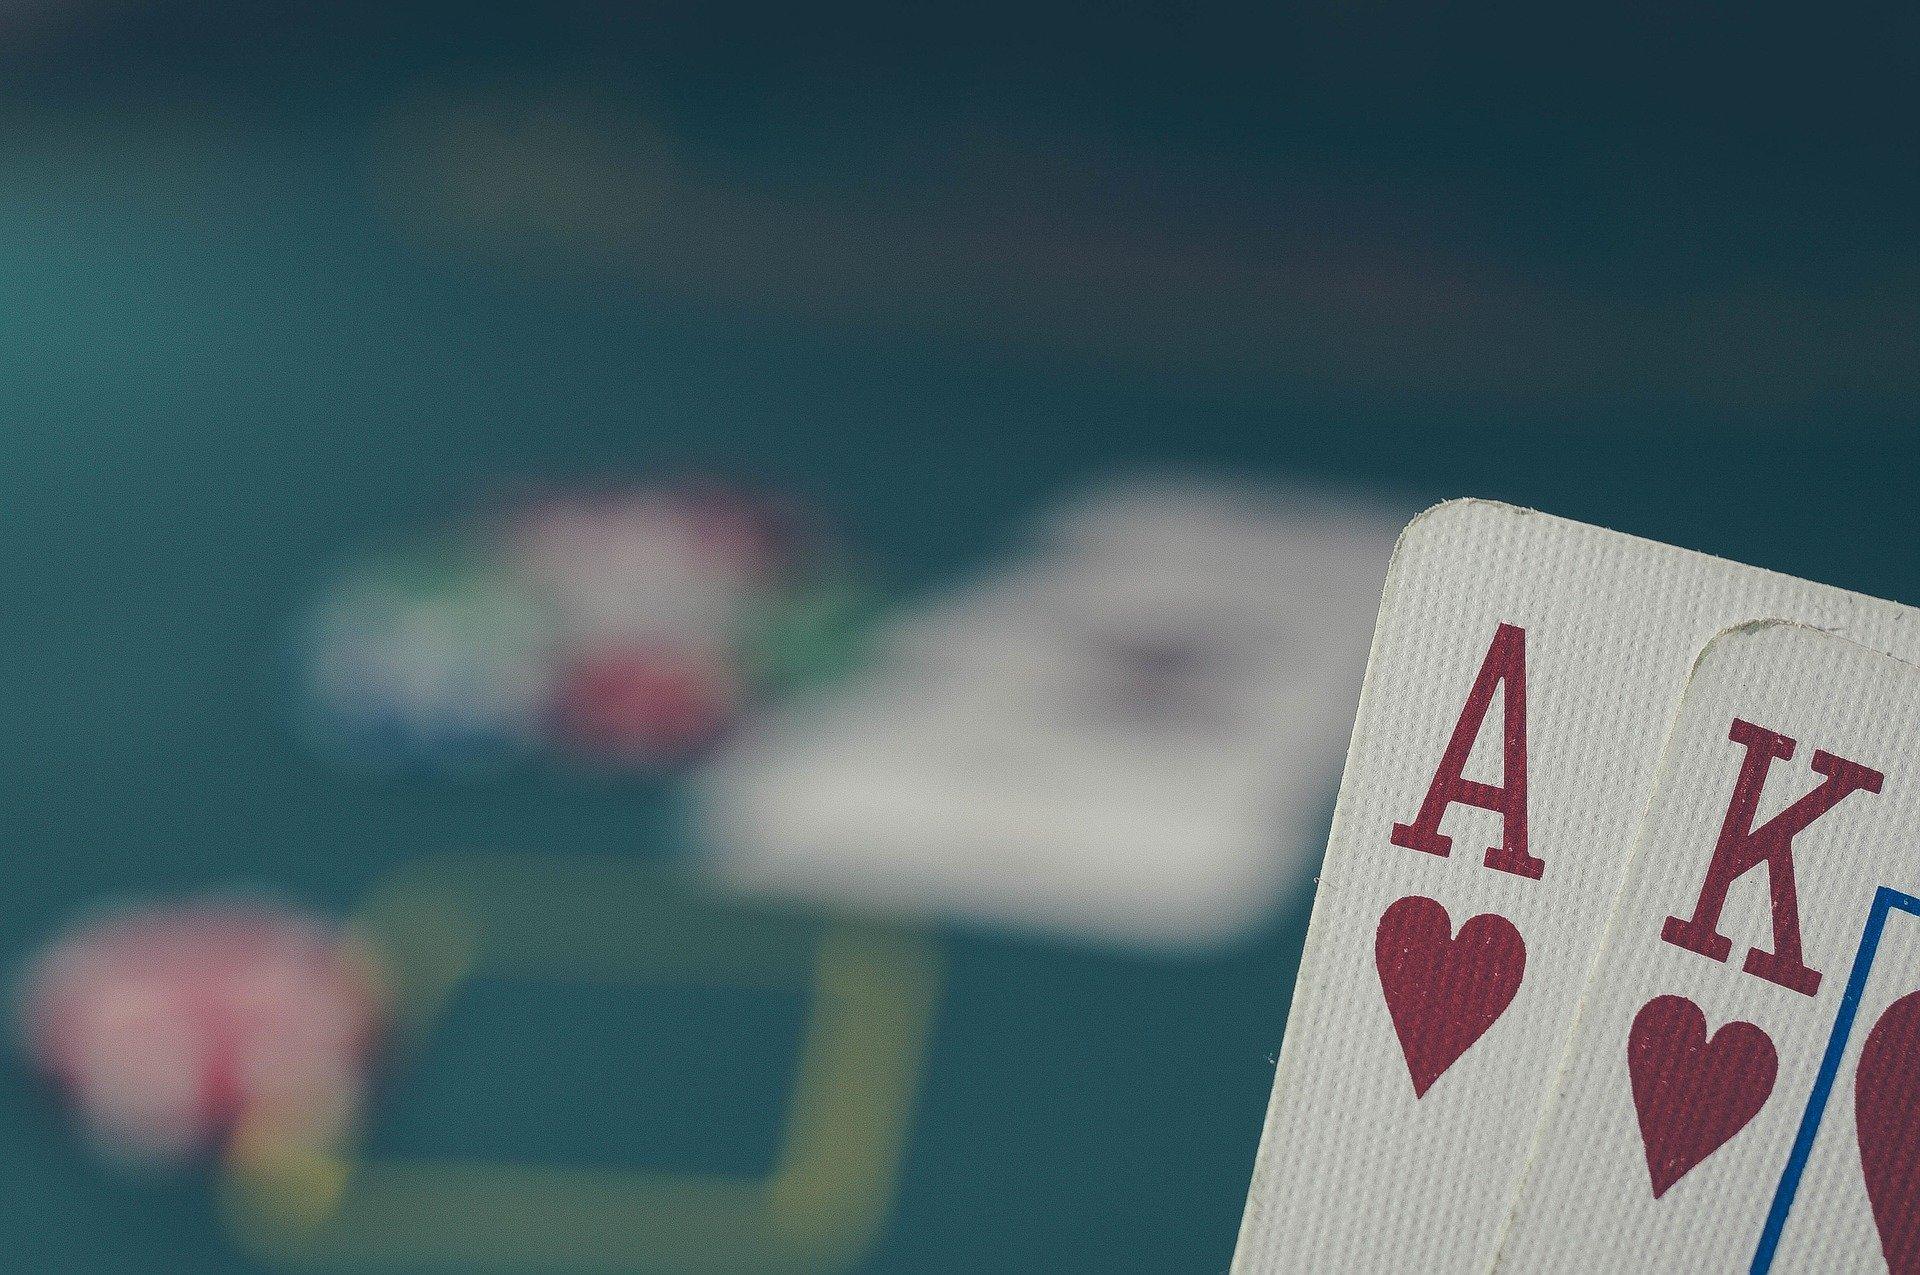 Drückglück Gewinnchancen Glücksspiel - 709621